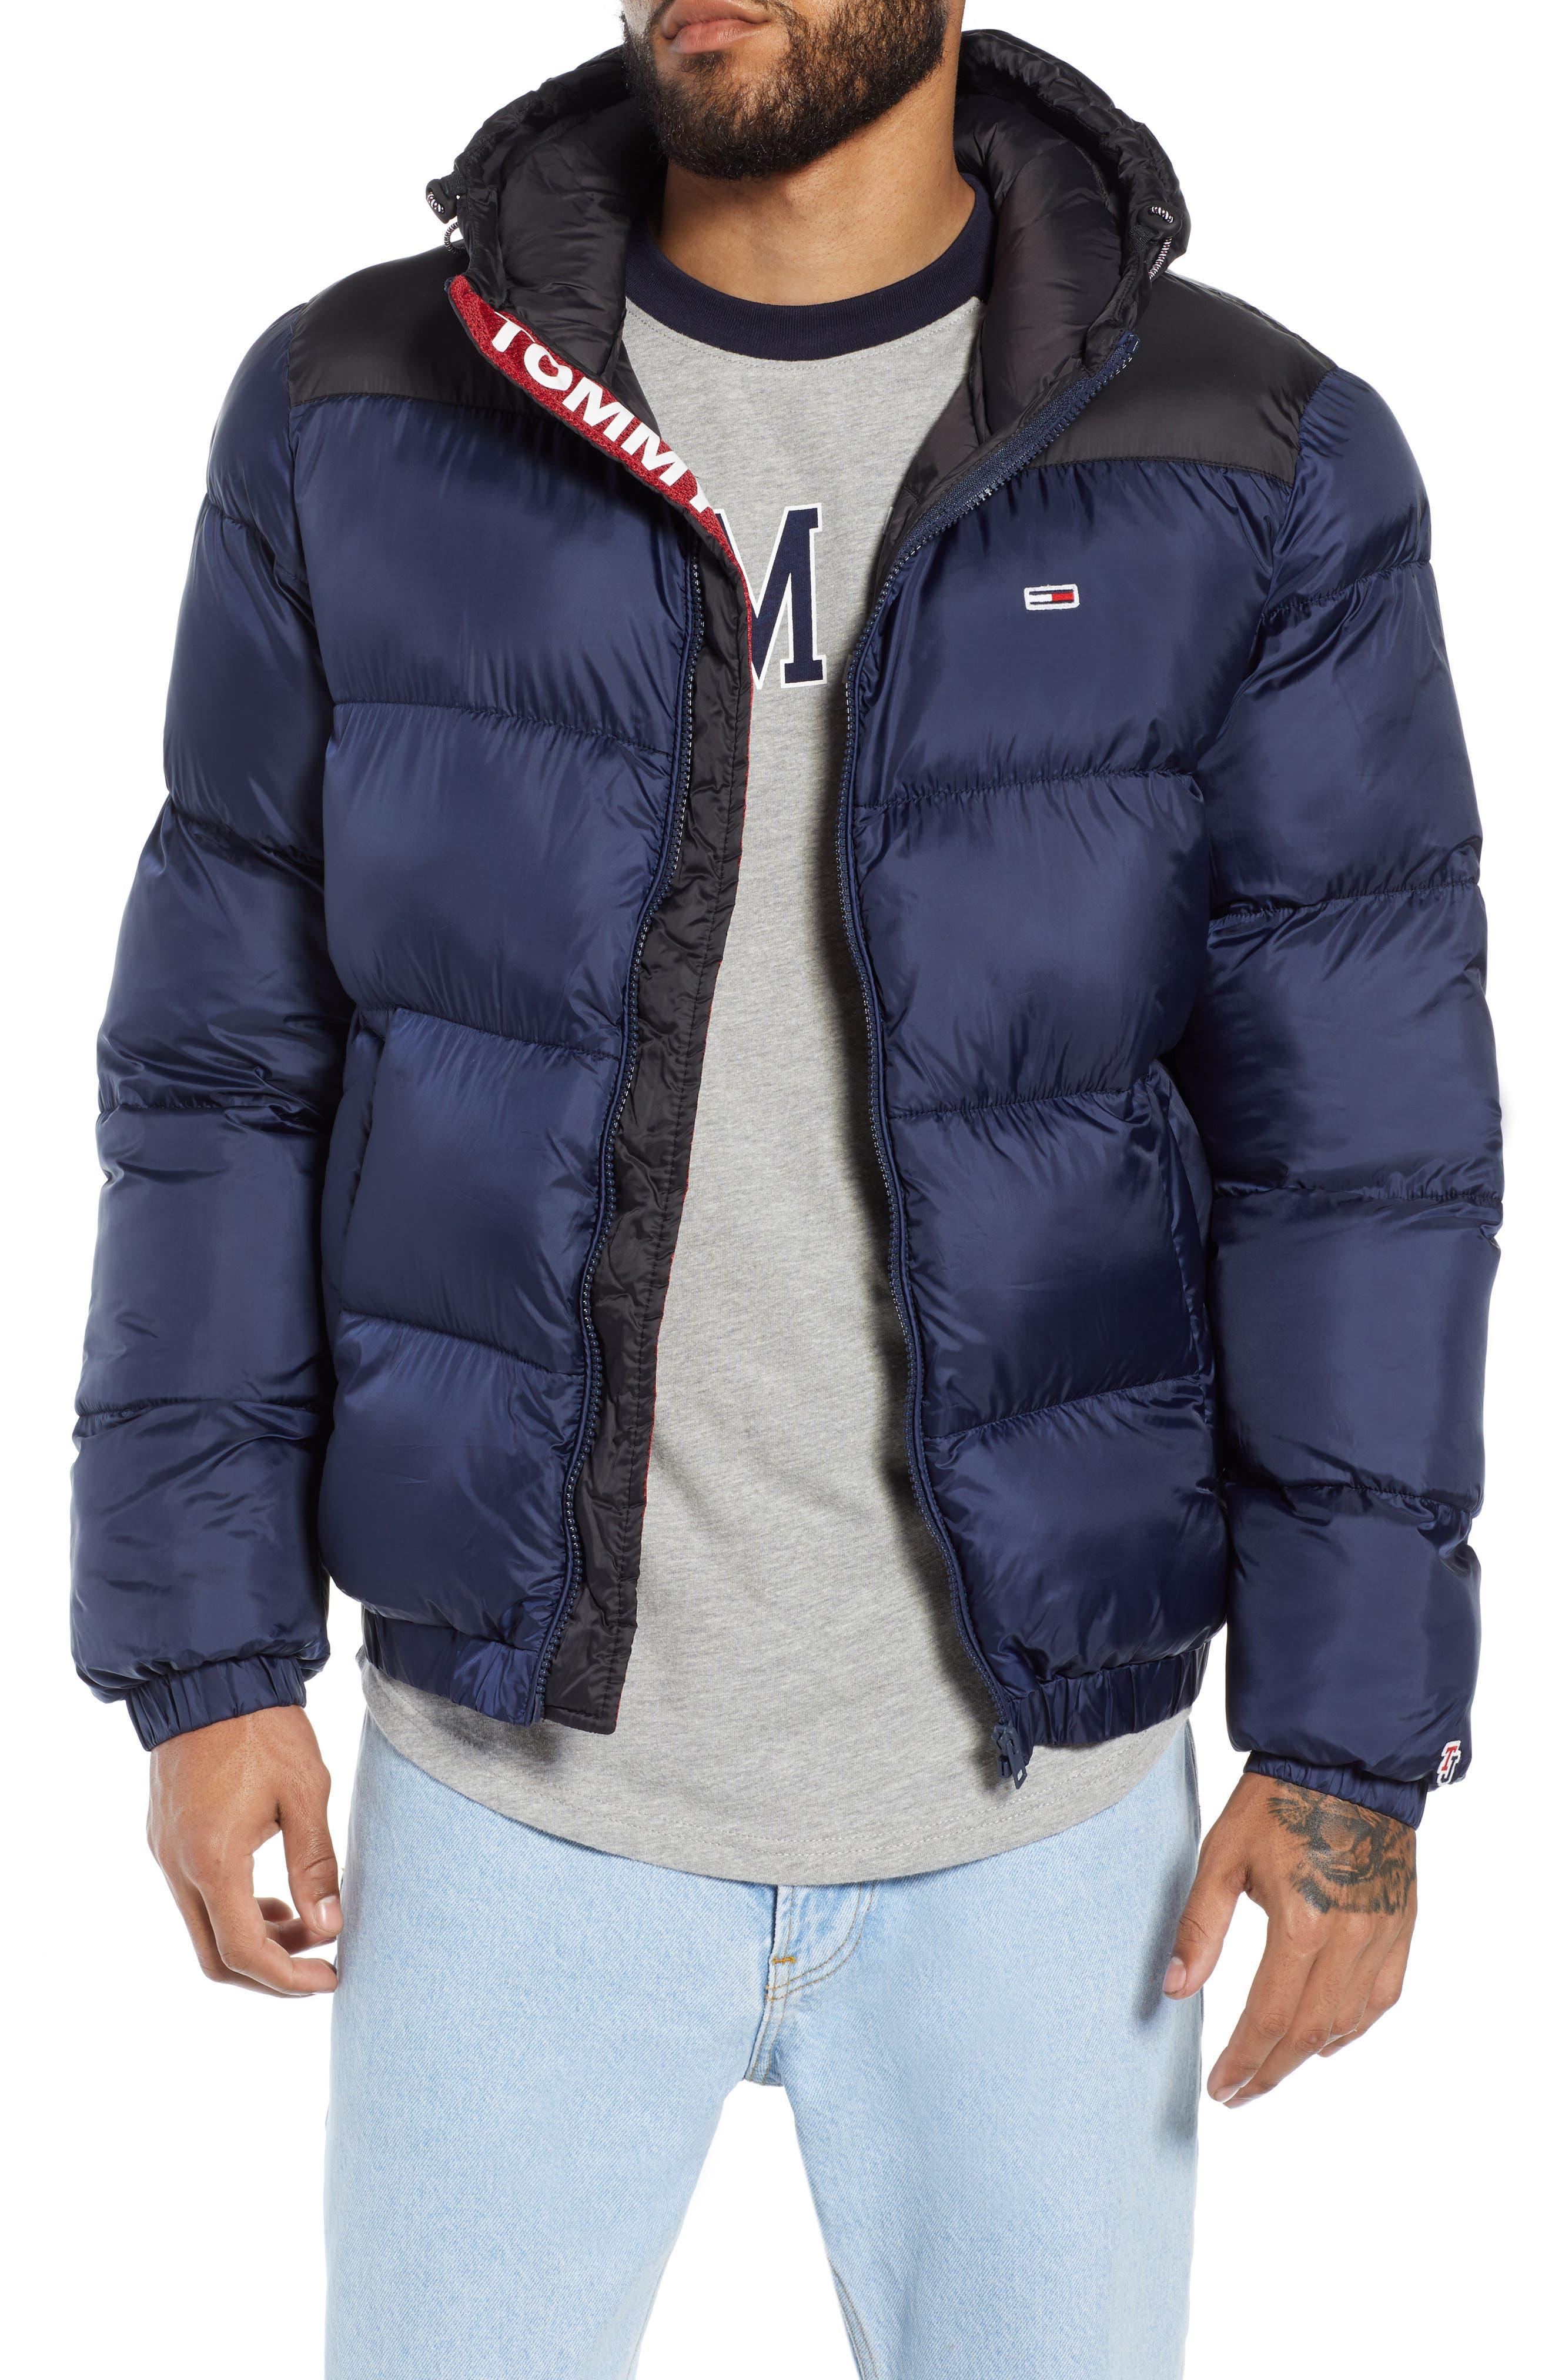 Classics Hooded Jacket,                             Main thumbnail 1, color,                             BLACK IRIS / TOMMY BLACK